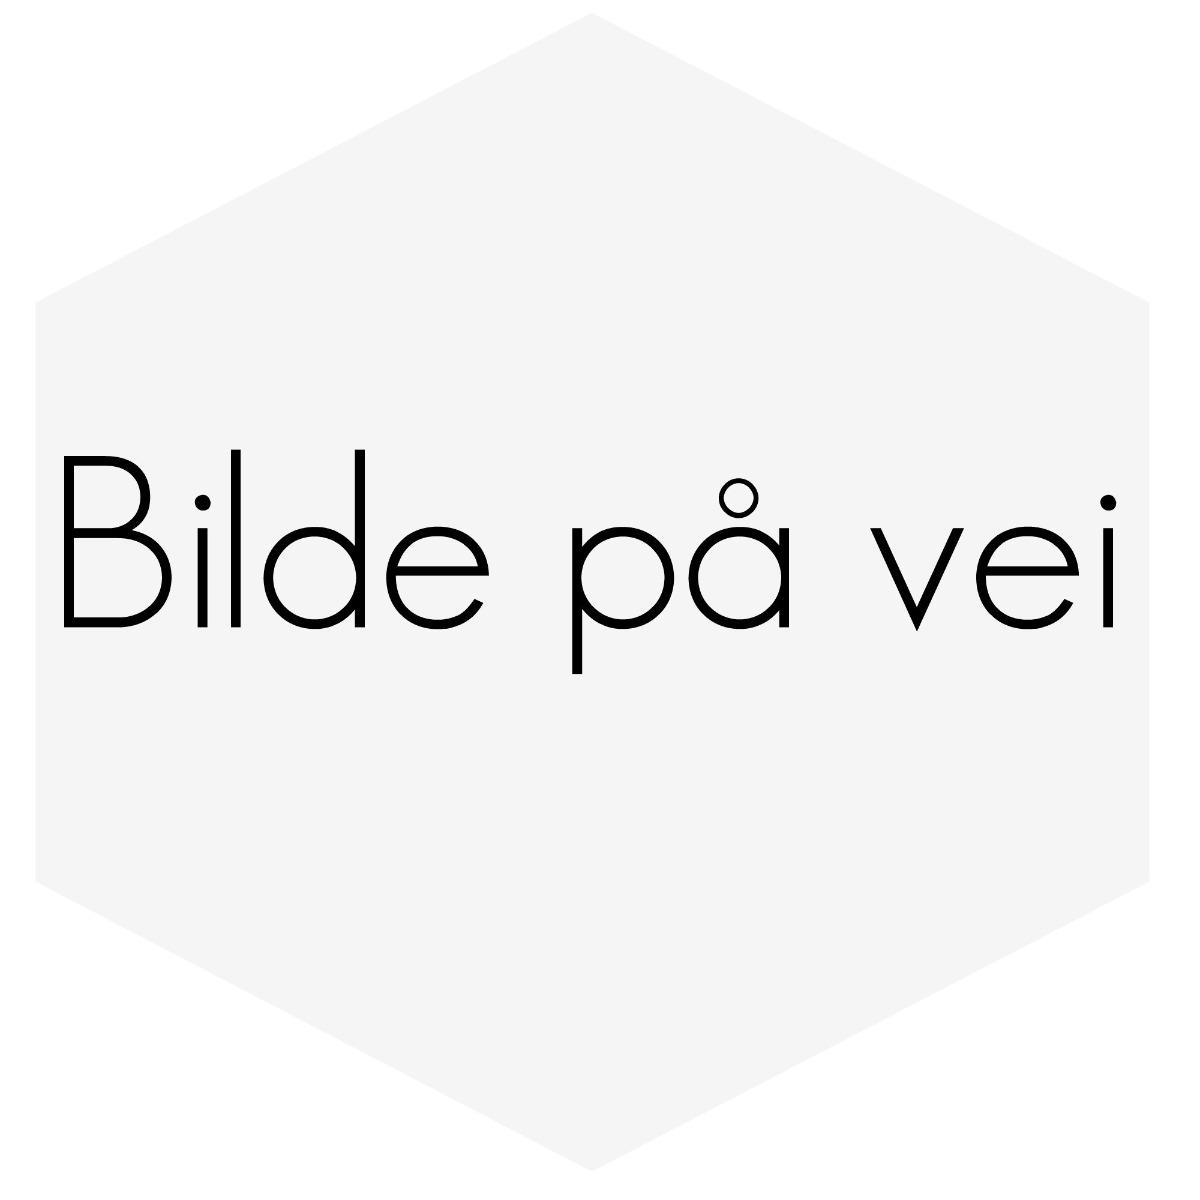 SILIKONSLANGE SVART FLEKSIBEL 15MM, 4 METER